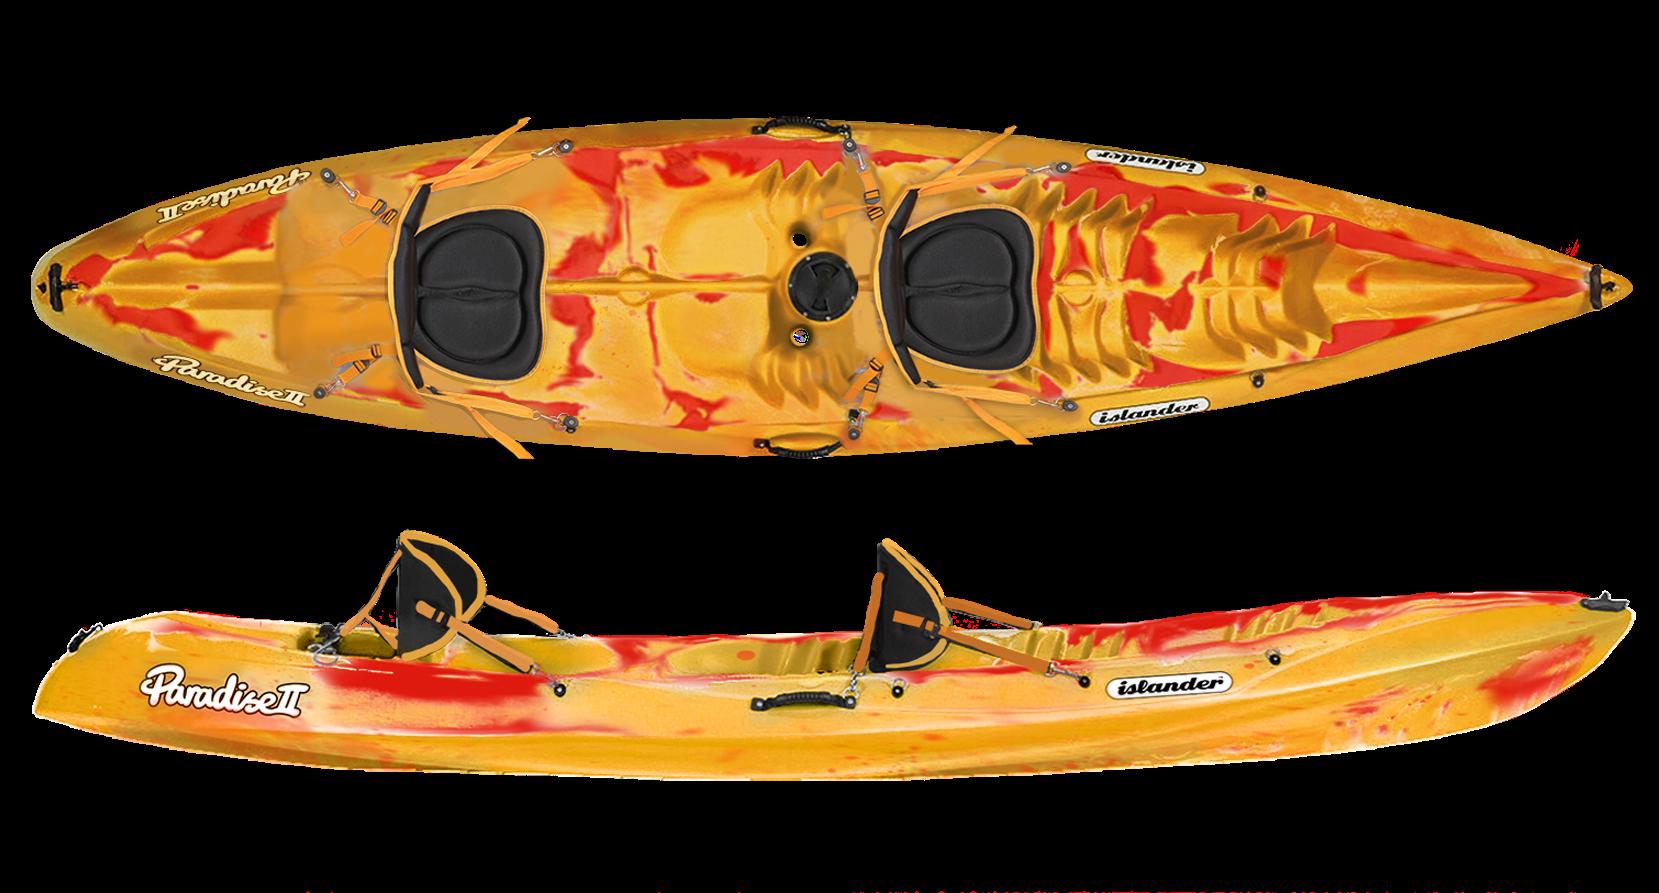 Double Kayak (2 People = 1 Participant)